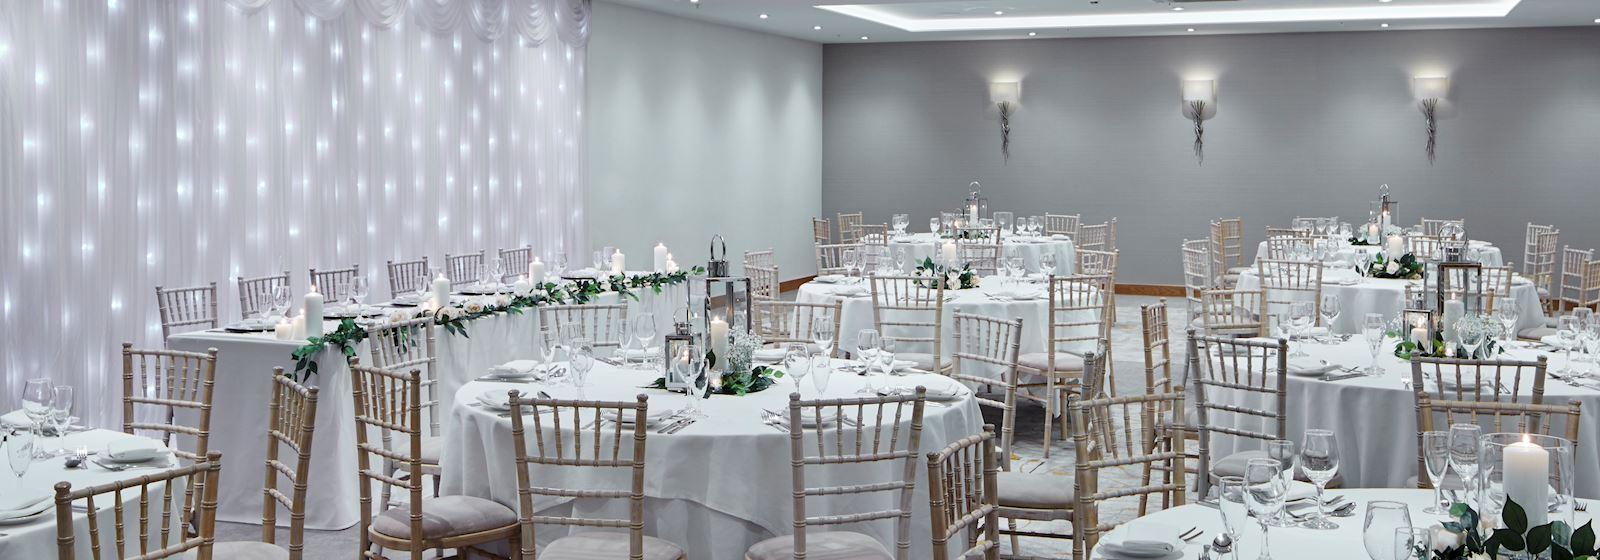 Cheshunt Marriott Hotel Weddings